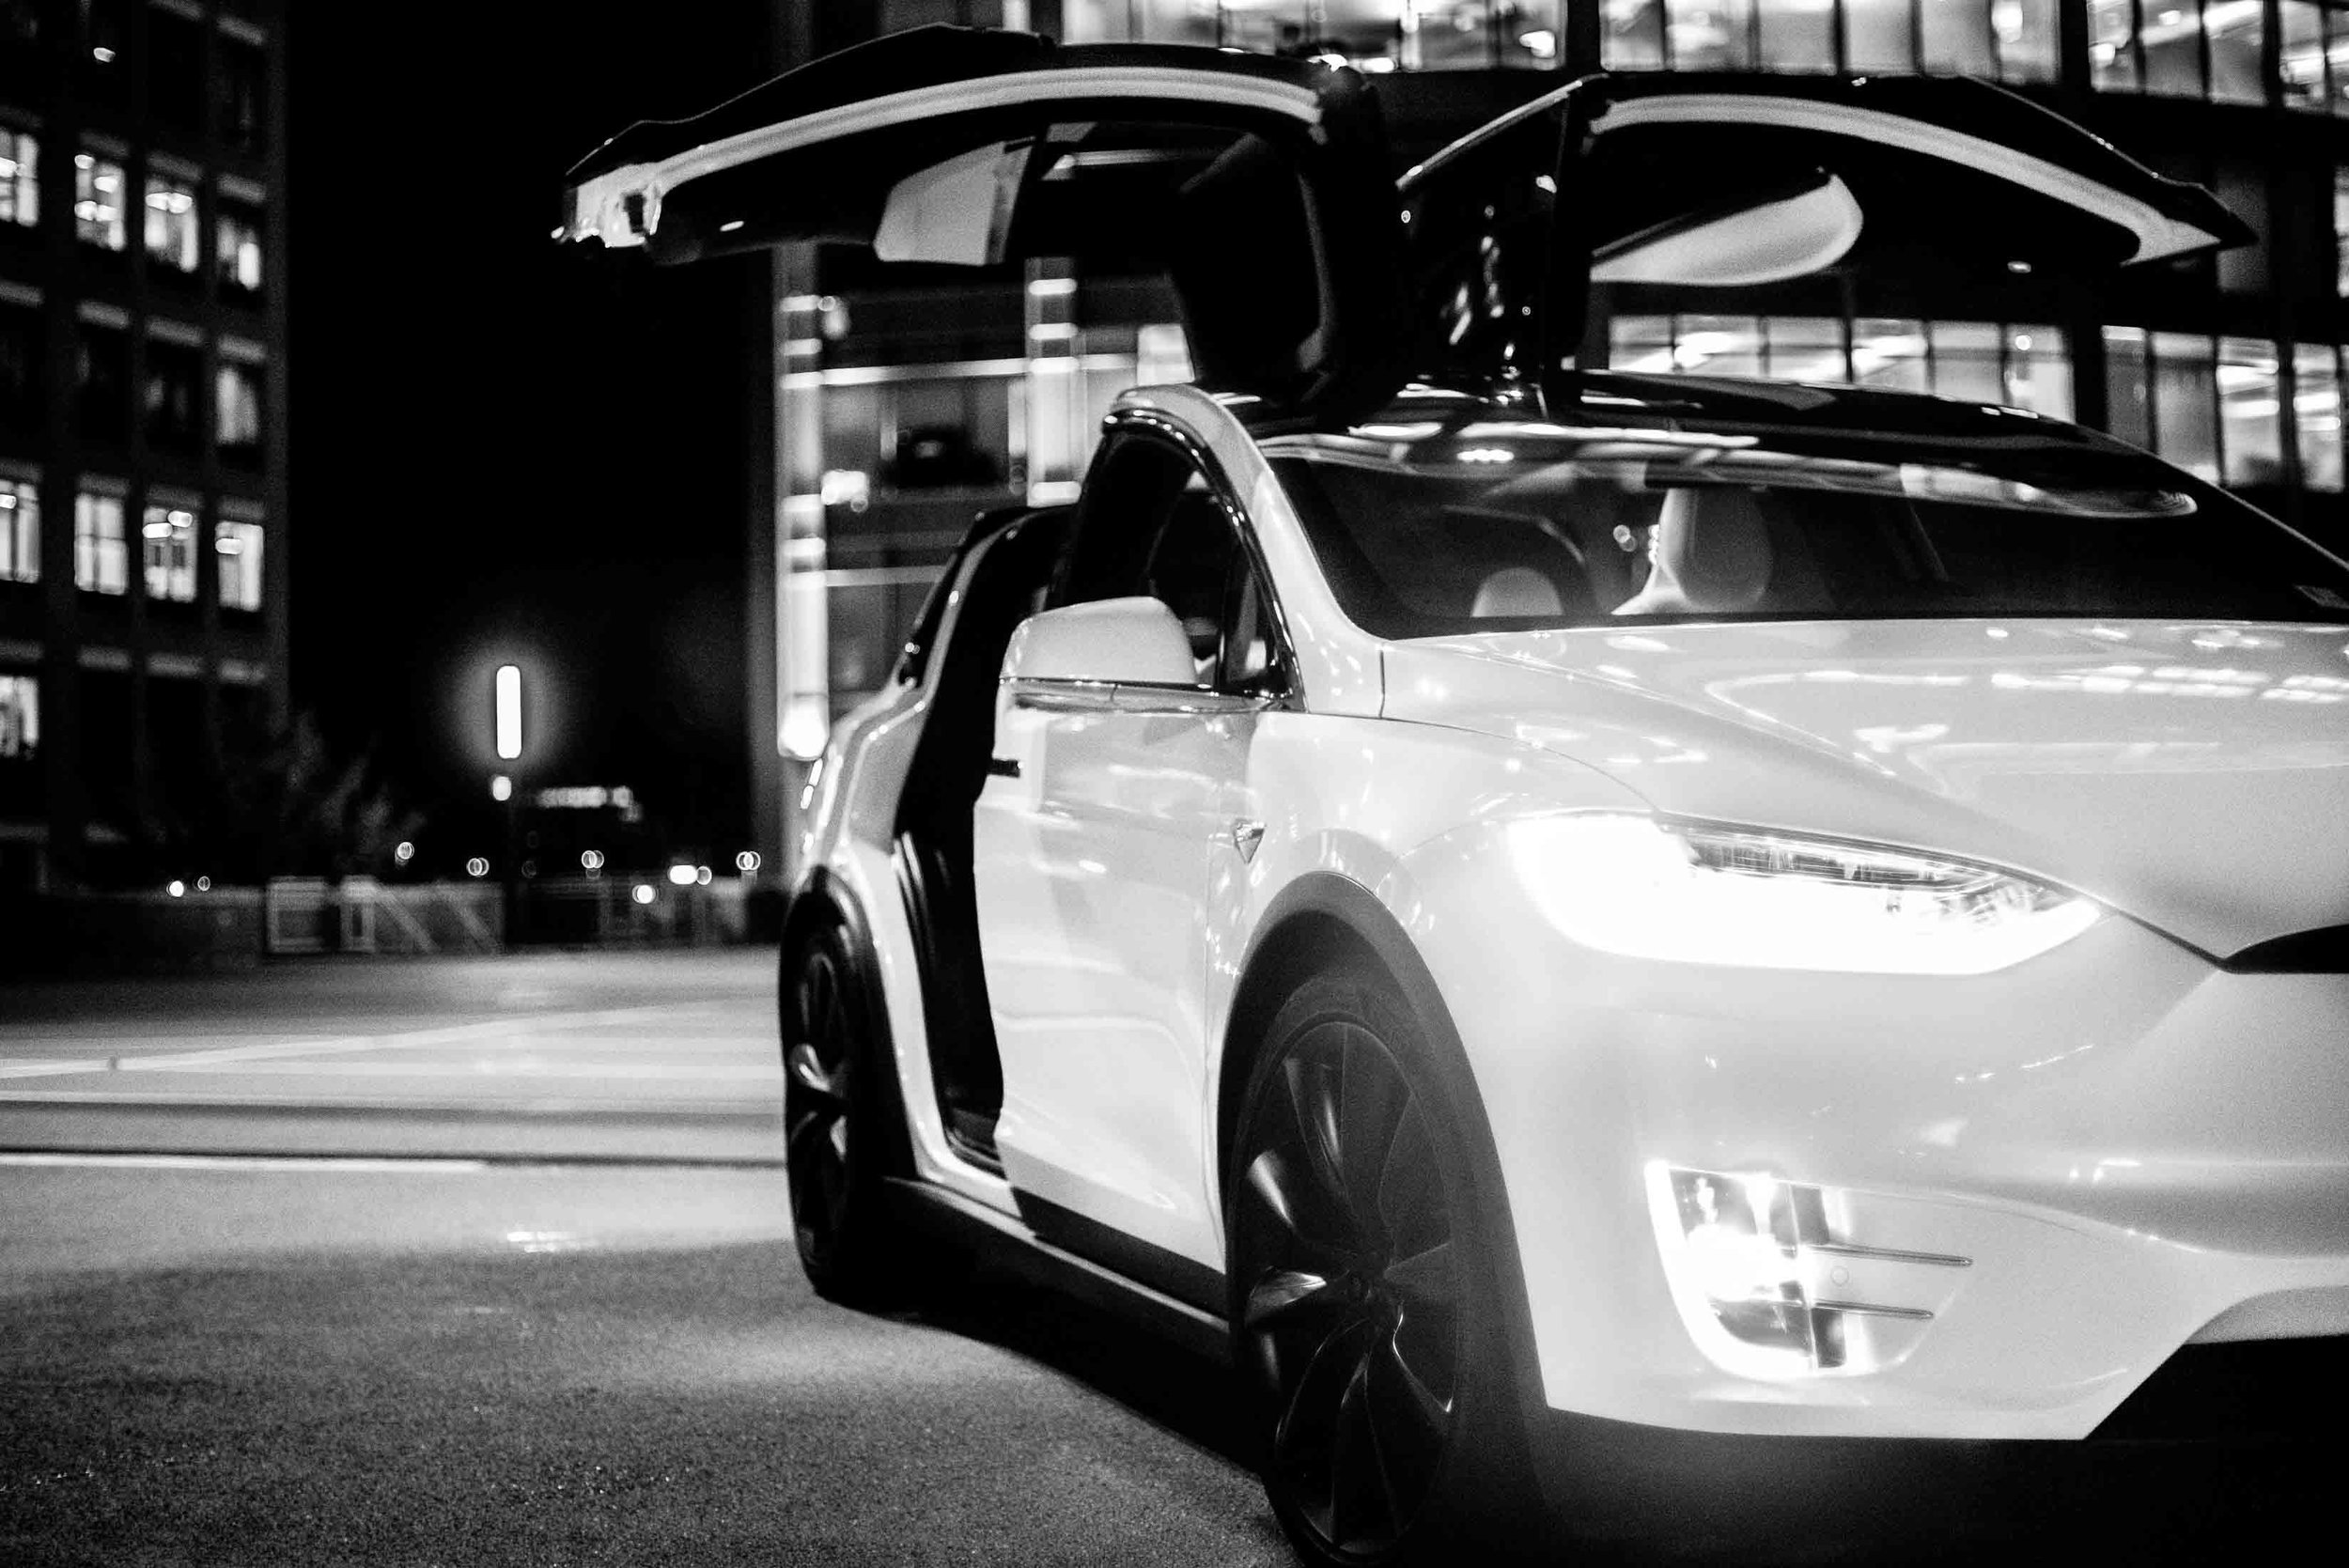 fleet+vehicle+sexy+car+photo+video+speed+tesla+p100d+vadym+guliuk+photography-8.jpg